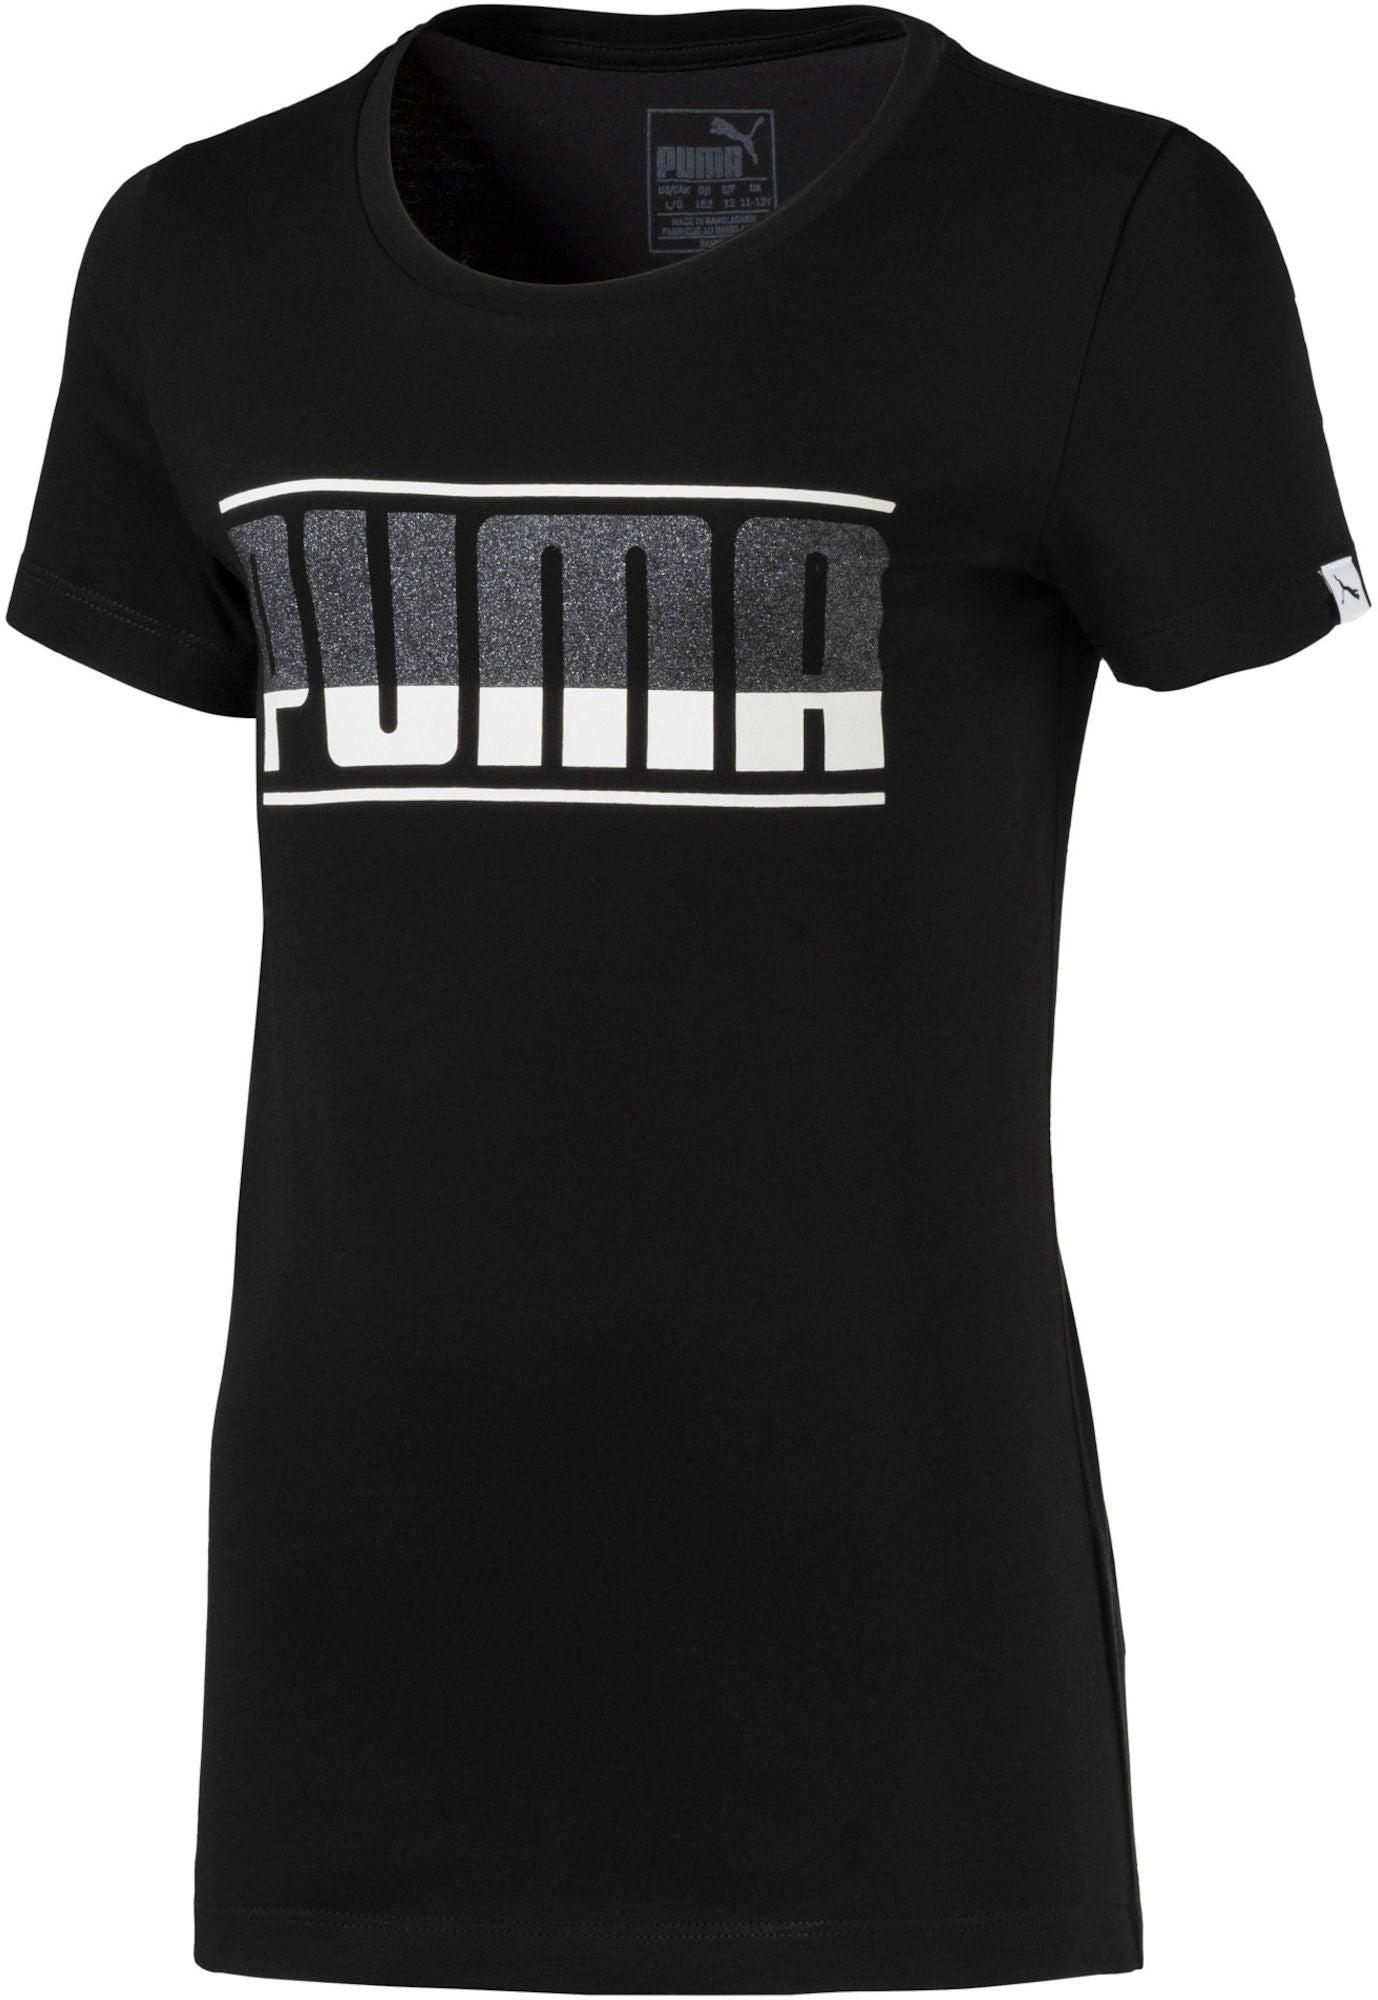 4a0fb7464c9e Köp Puma Style Graphic Tee, Black | Jollyroom